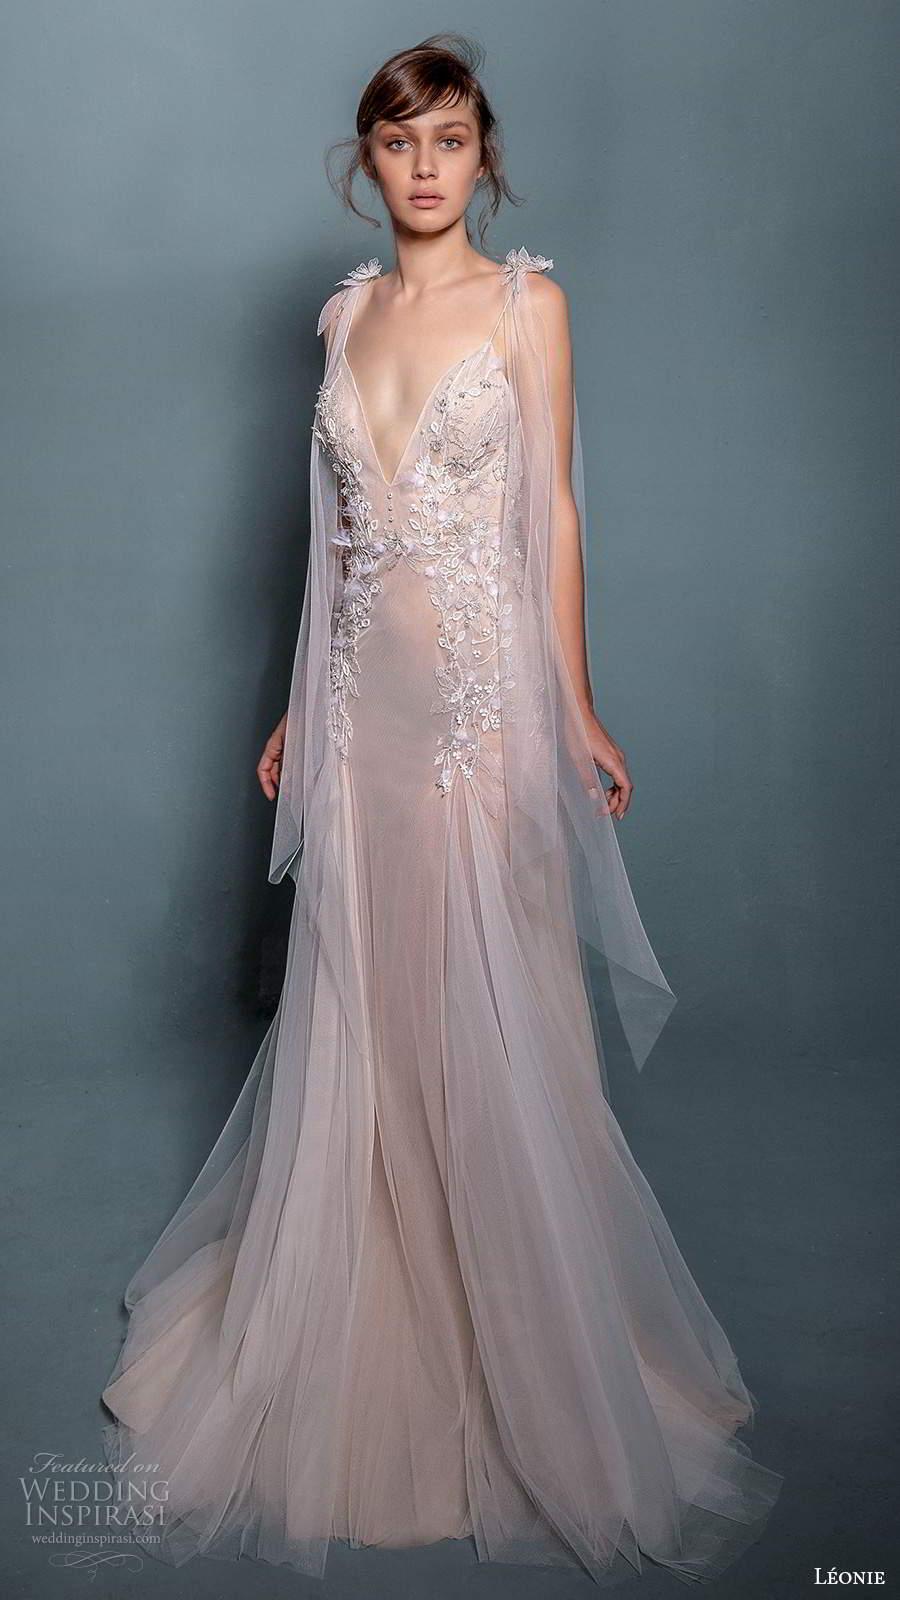 leonie bridal 2020 bridal sleeveless ribbon tie straps plunginv neckline embellished bodice fit flare a line wedding dress chapel train (7) mv